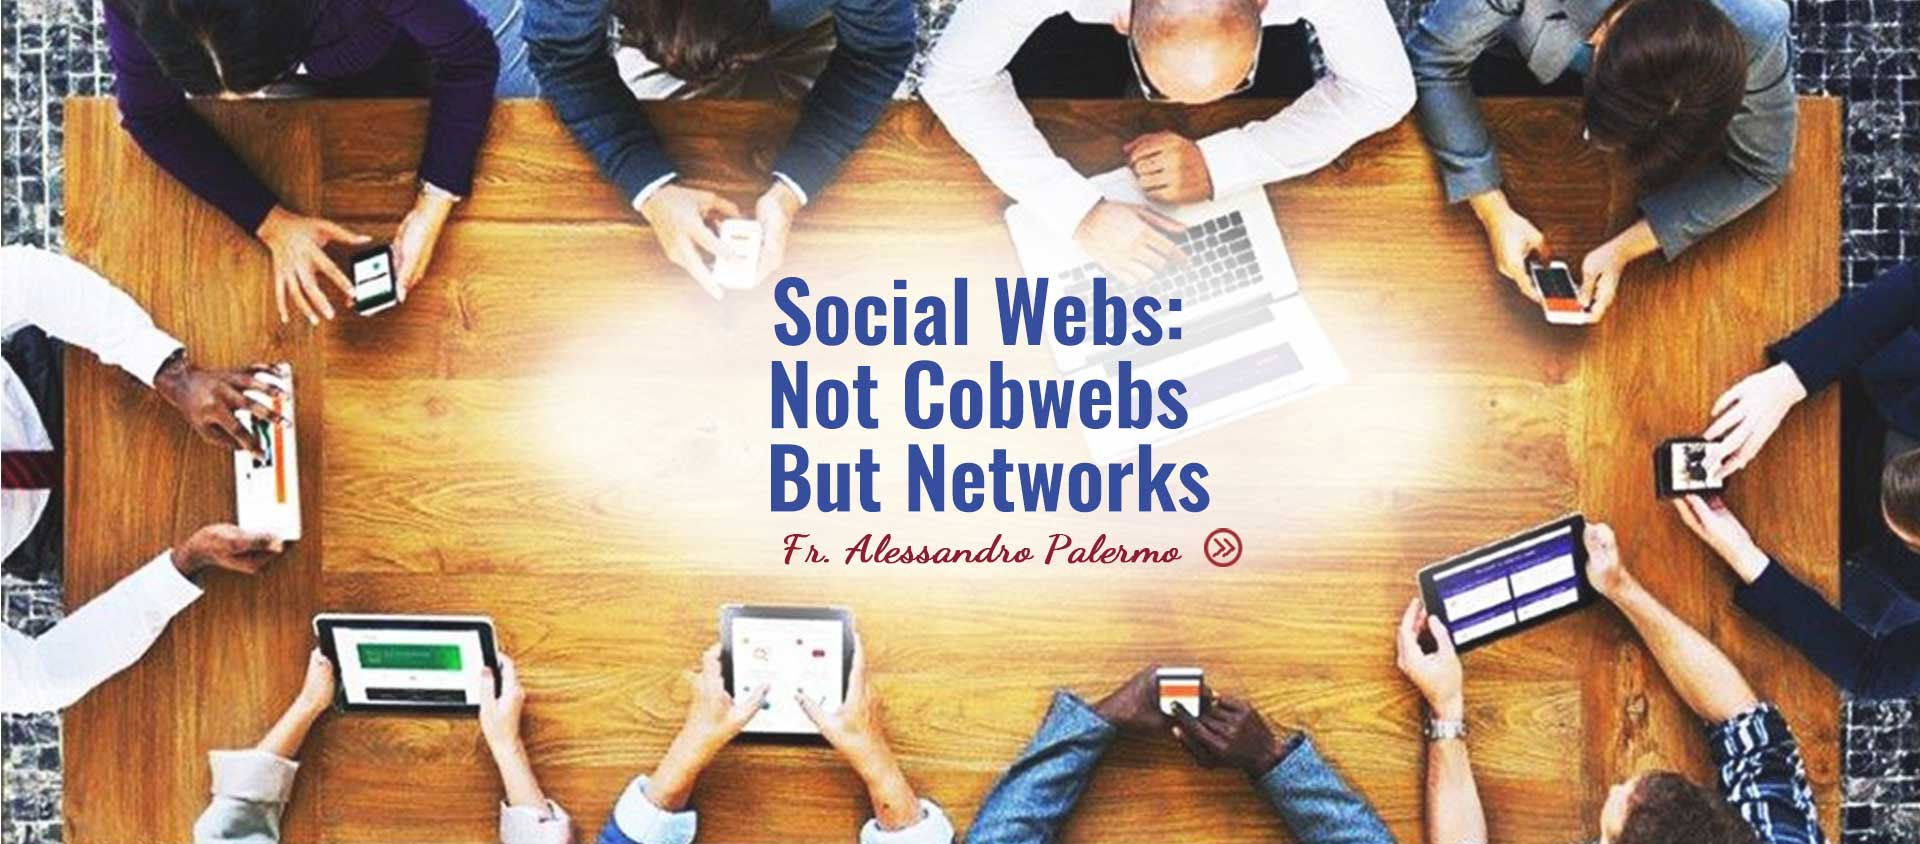 Social Webs